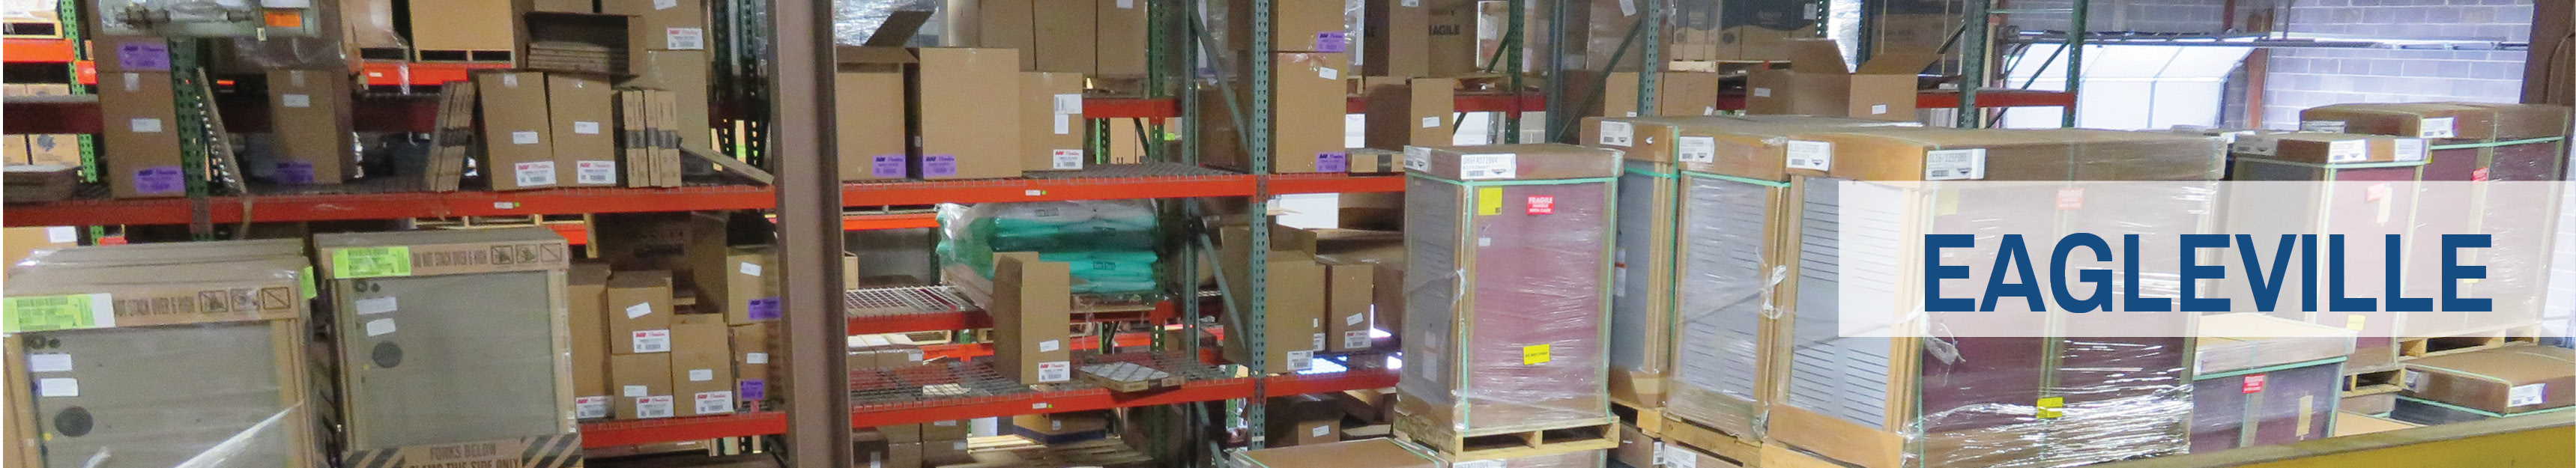 HVAC/R Supply in Eagleville Norristown